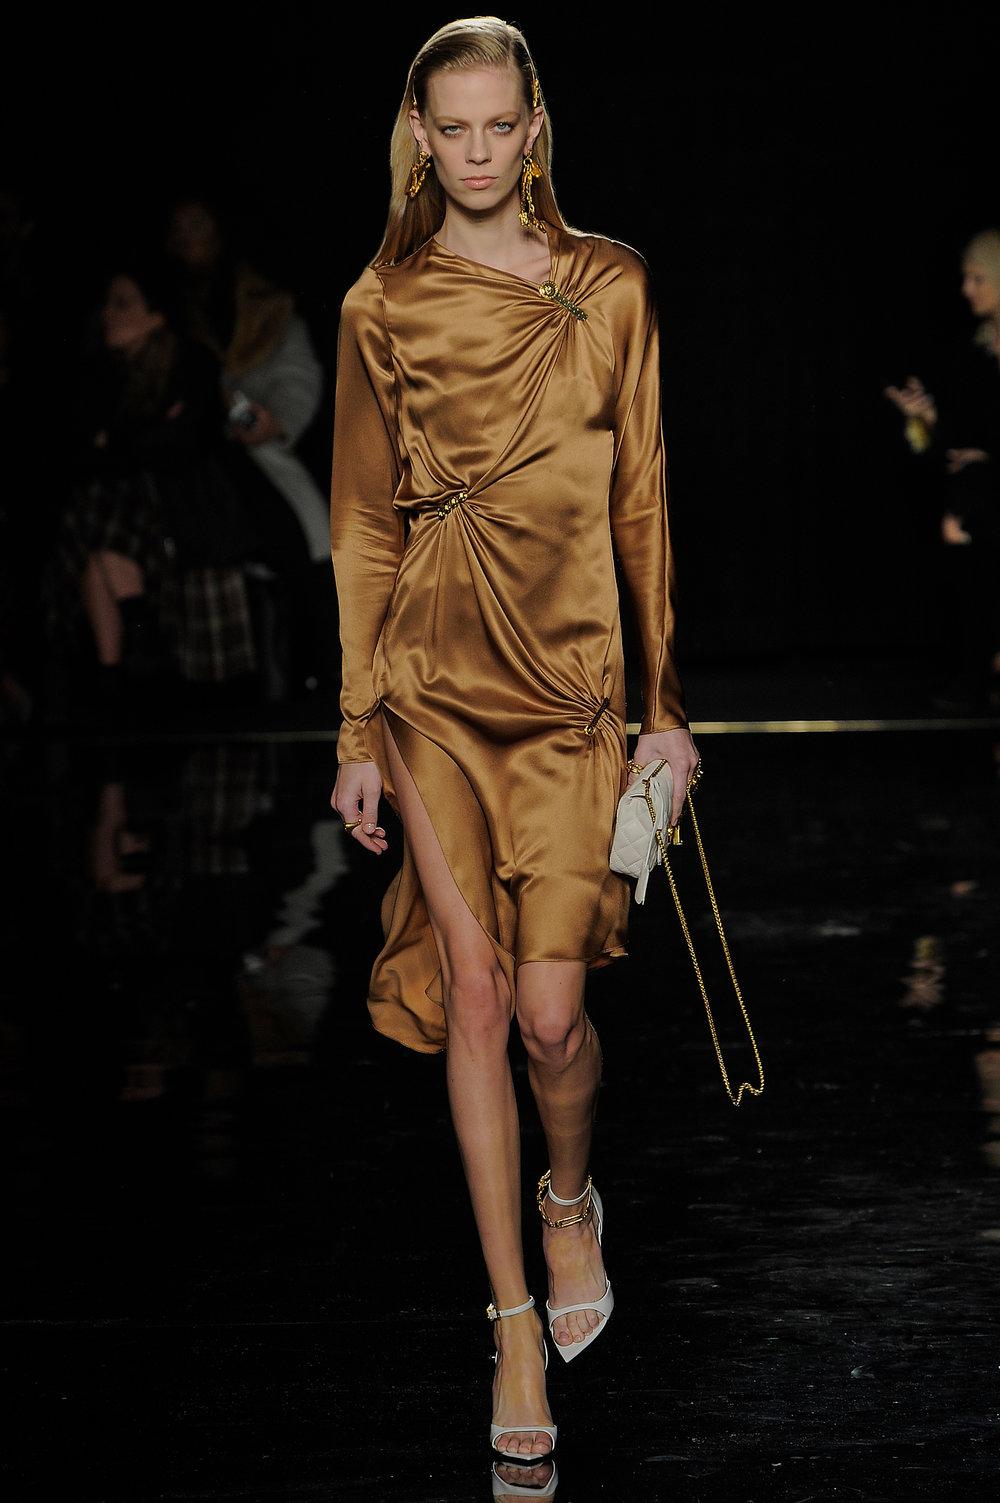 Versace_3_9d_versace_runway_runway_00003.jpg